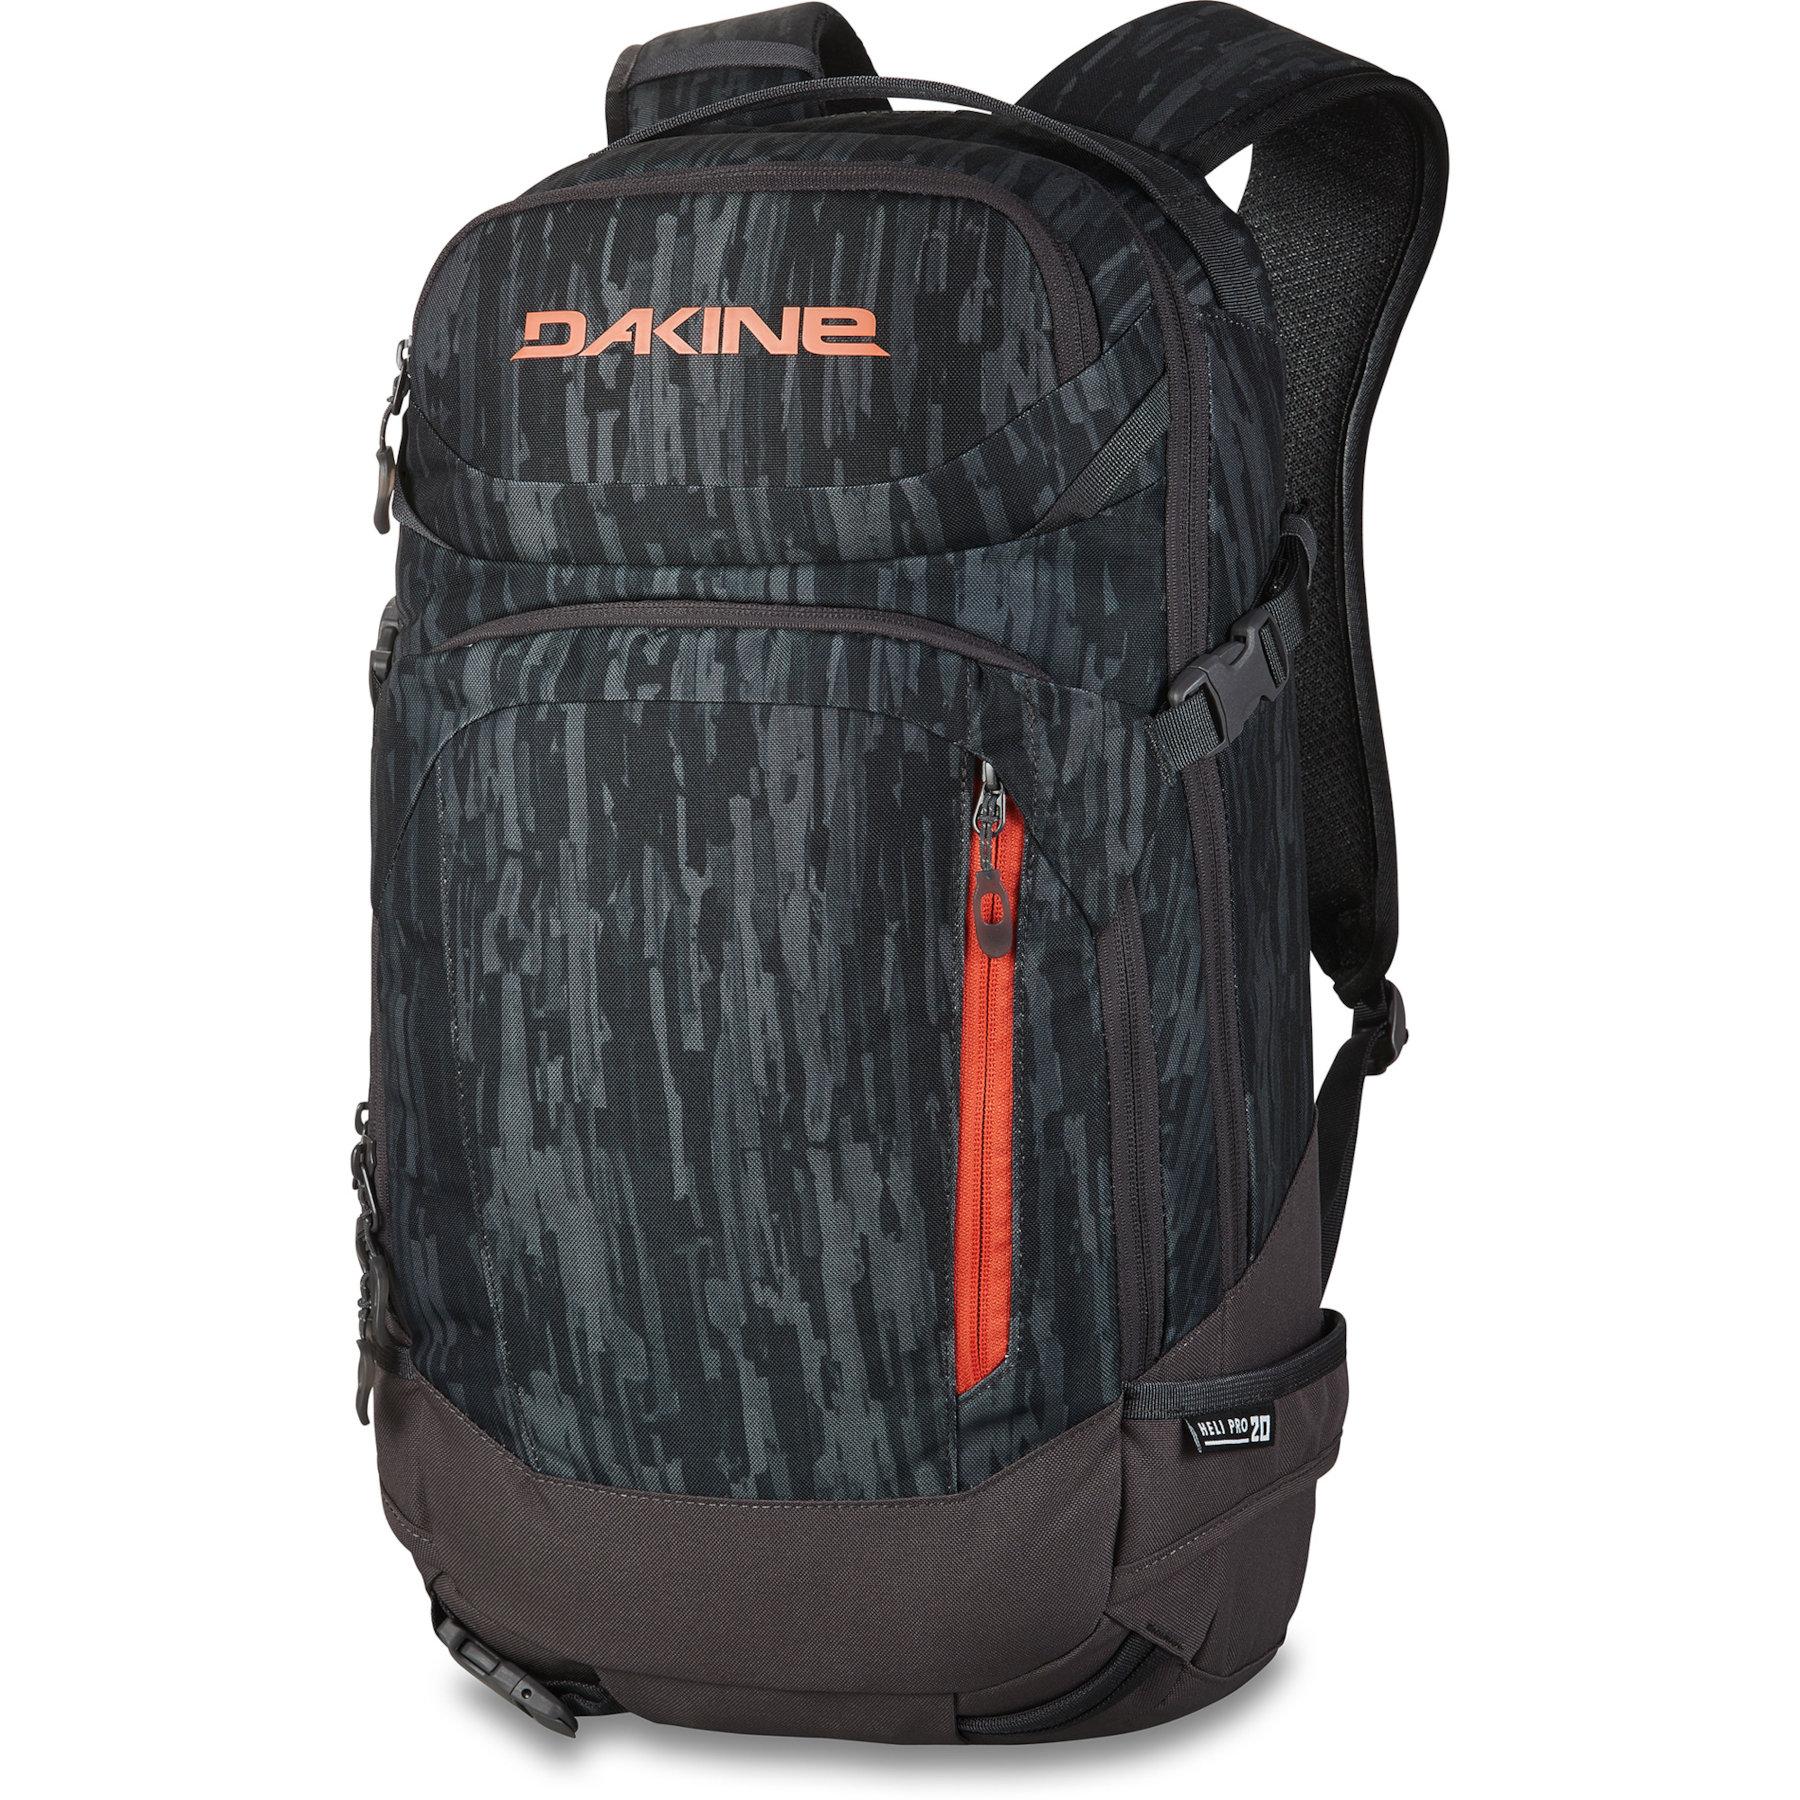 Dakine Heli Pro 20L Backpack - Shadow Dash